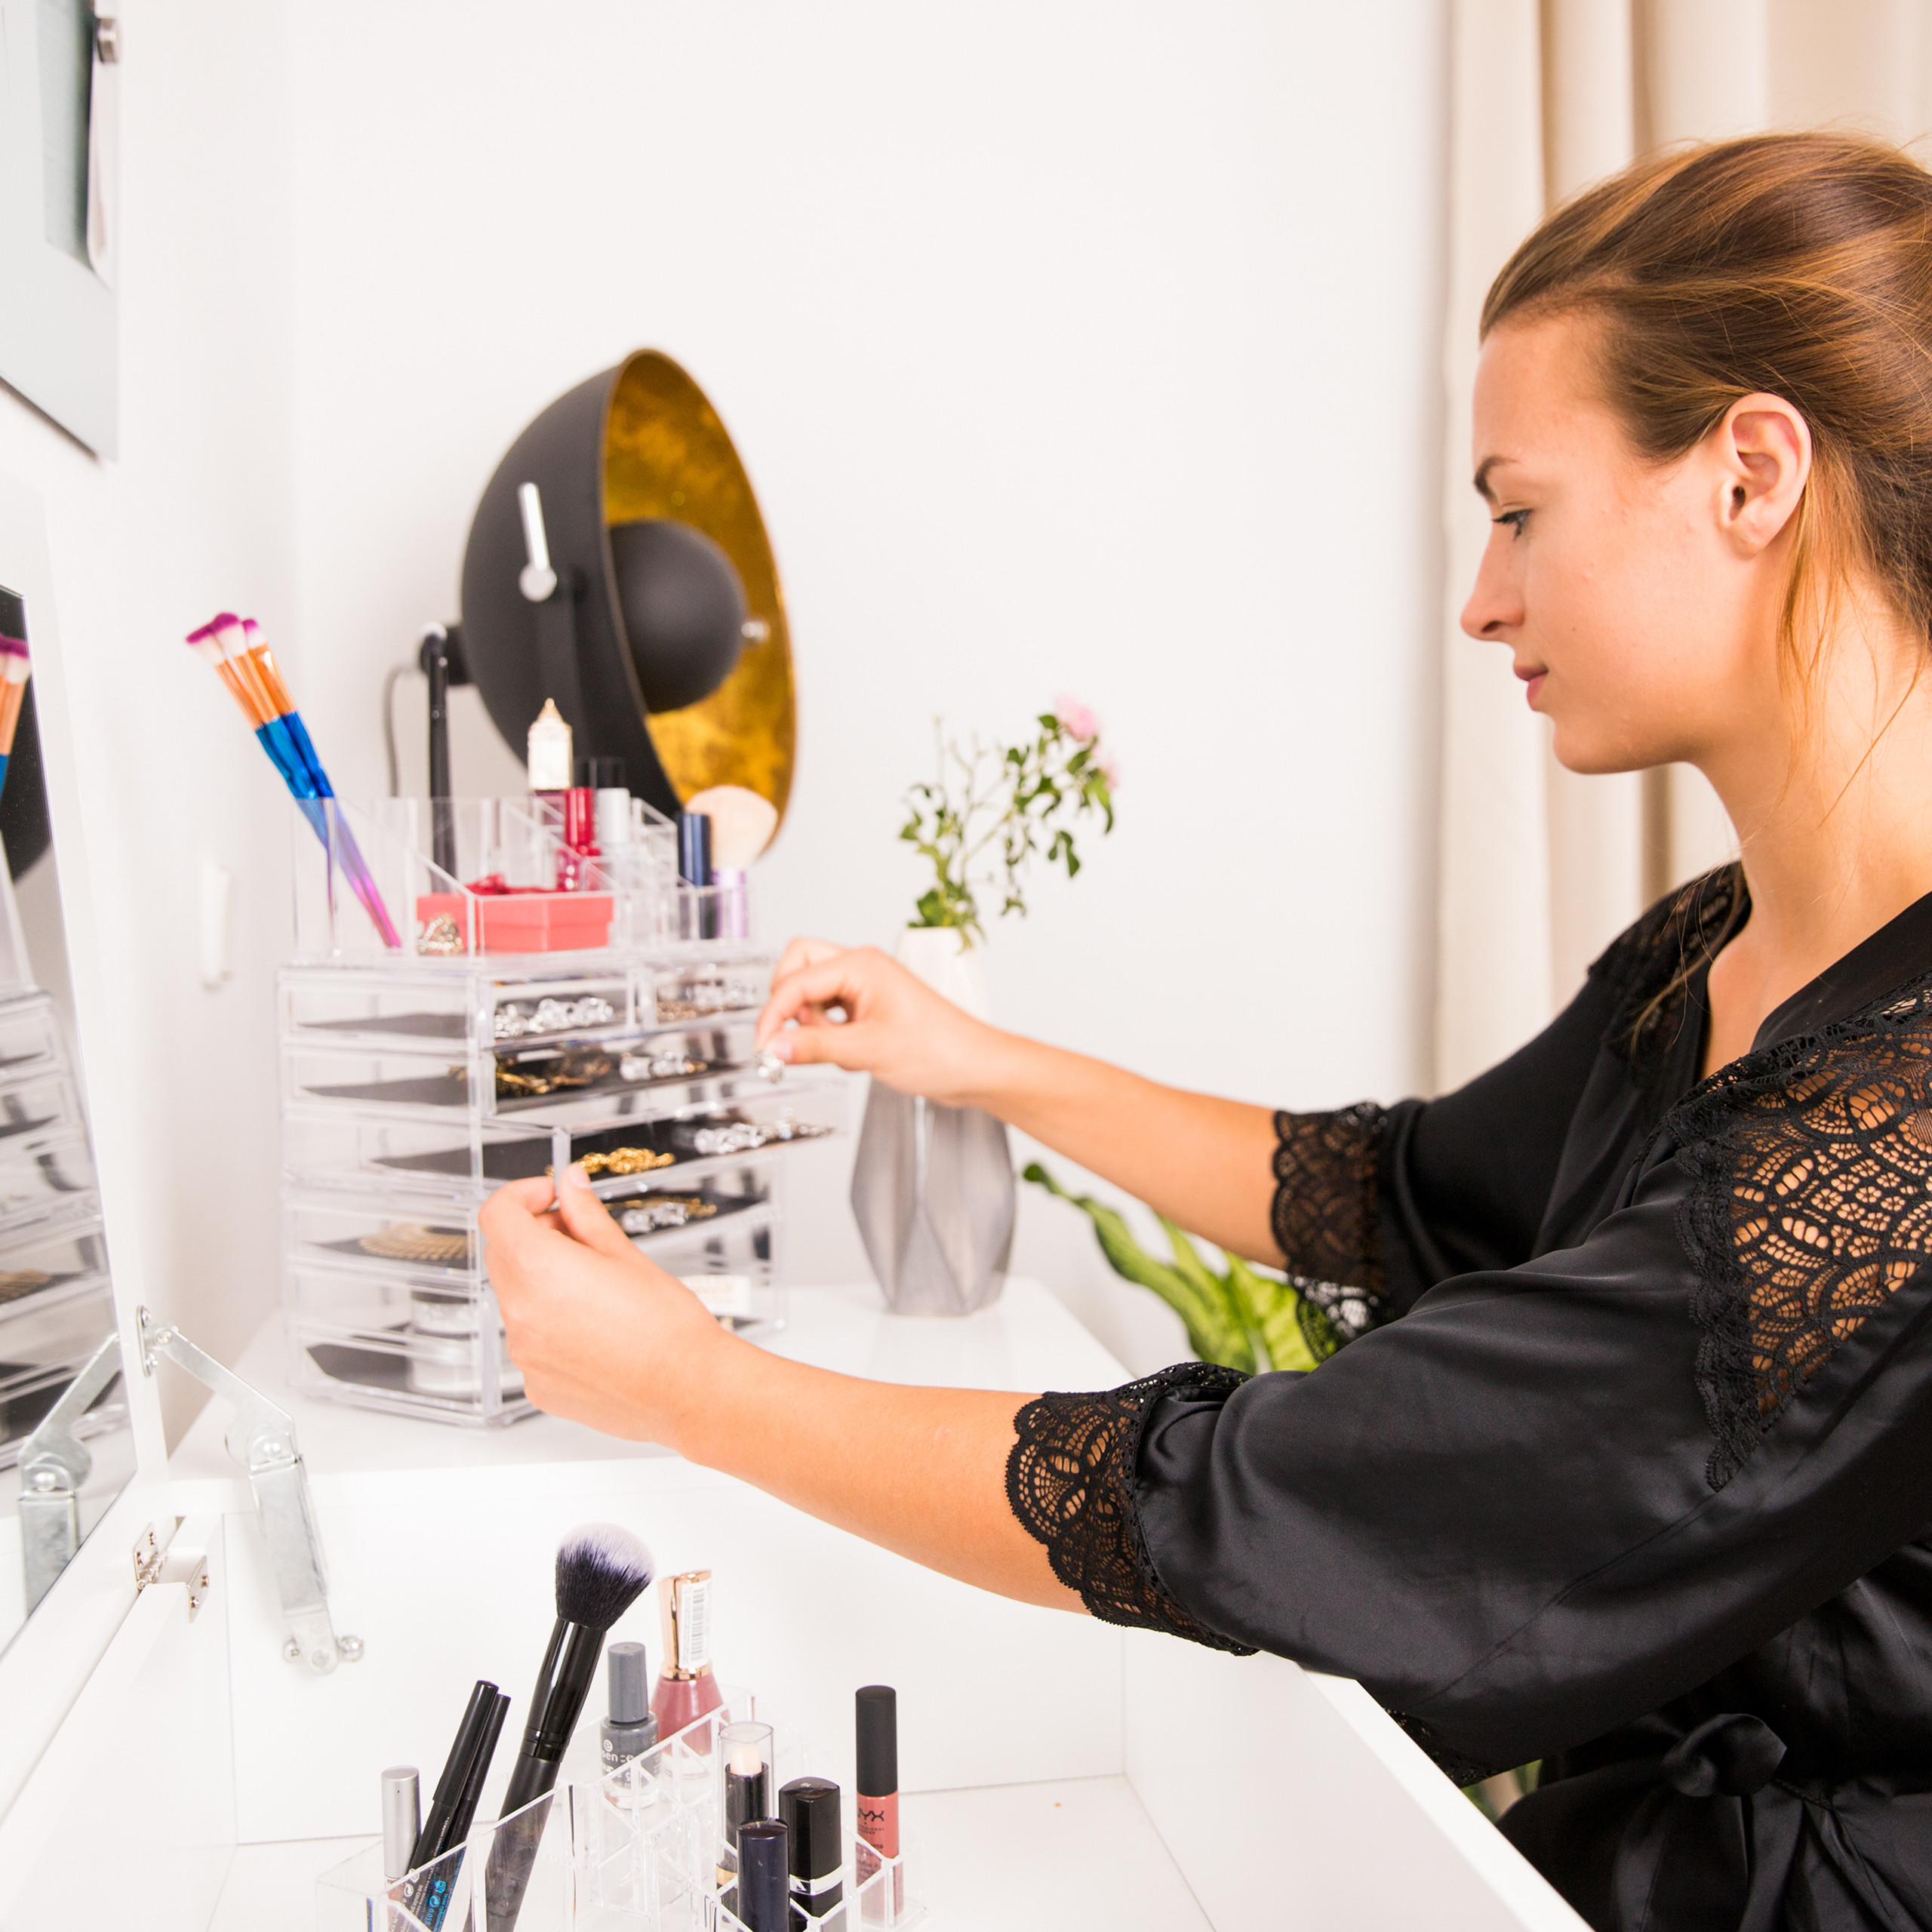 make-up-organizer-opbergen-van-cosmetica-acryl-stapelbaar-met-lades miniatuur 25